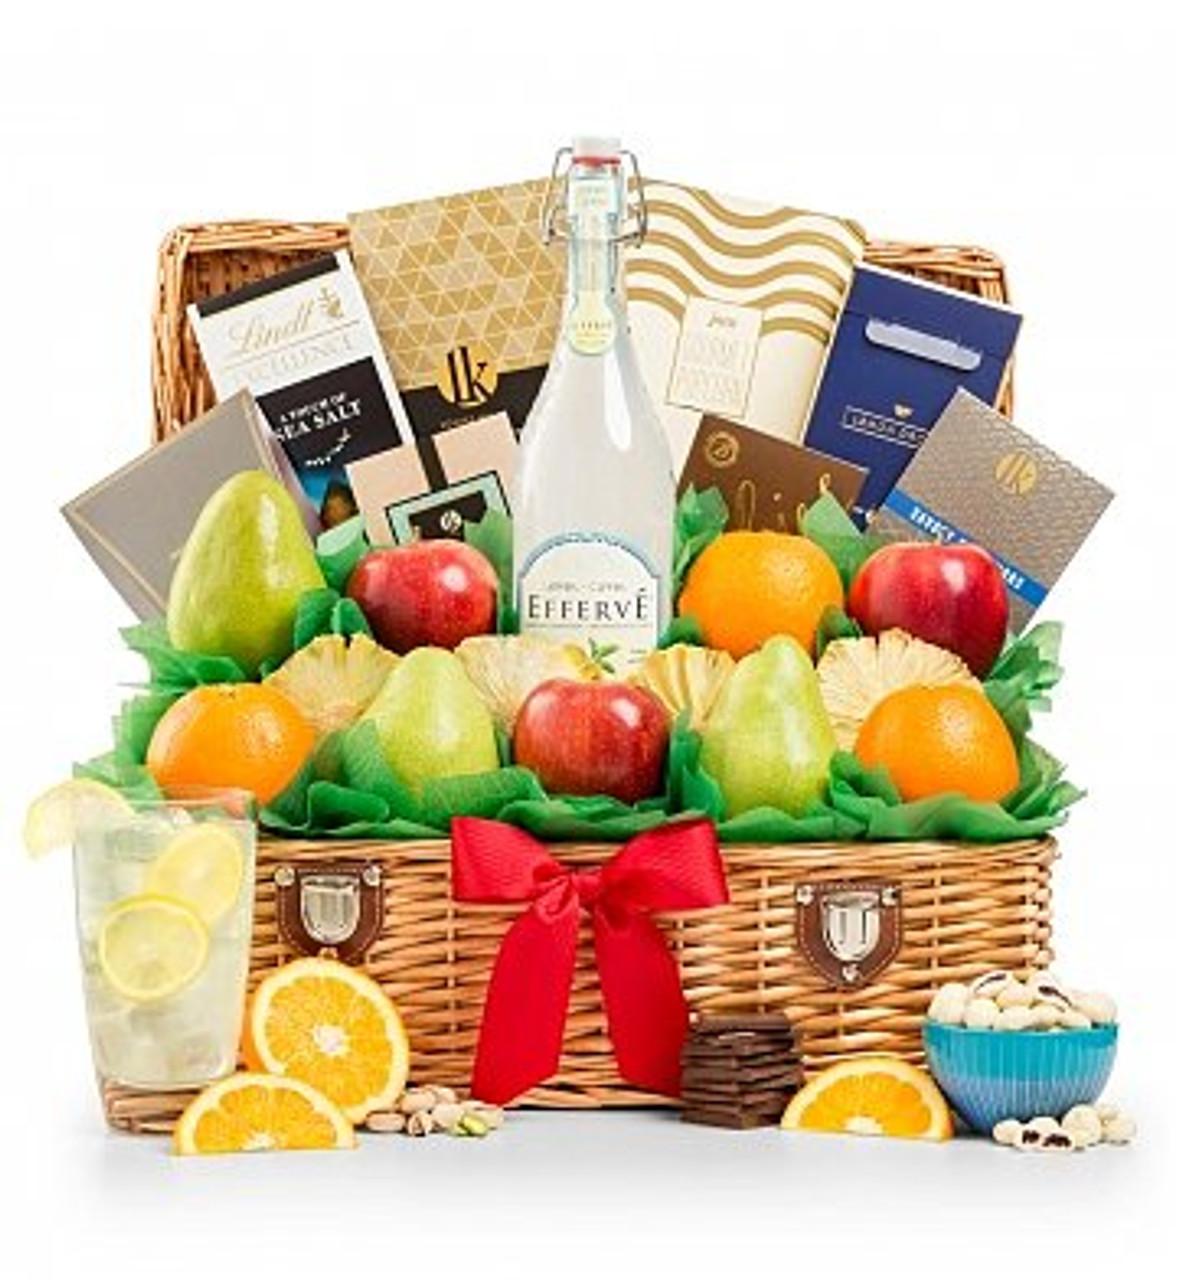 Orchard Premuim Grade Gourmet Picnic Gift Basket Twana S Creation Gourmet Gift Basket